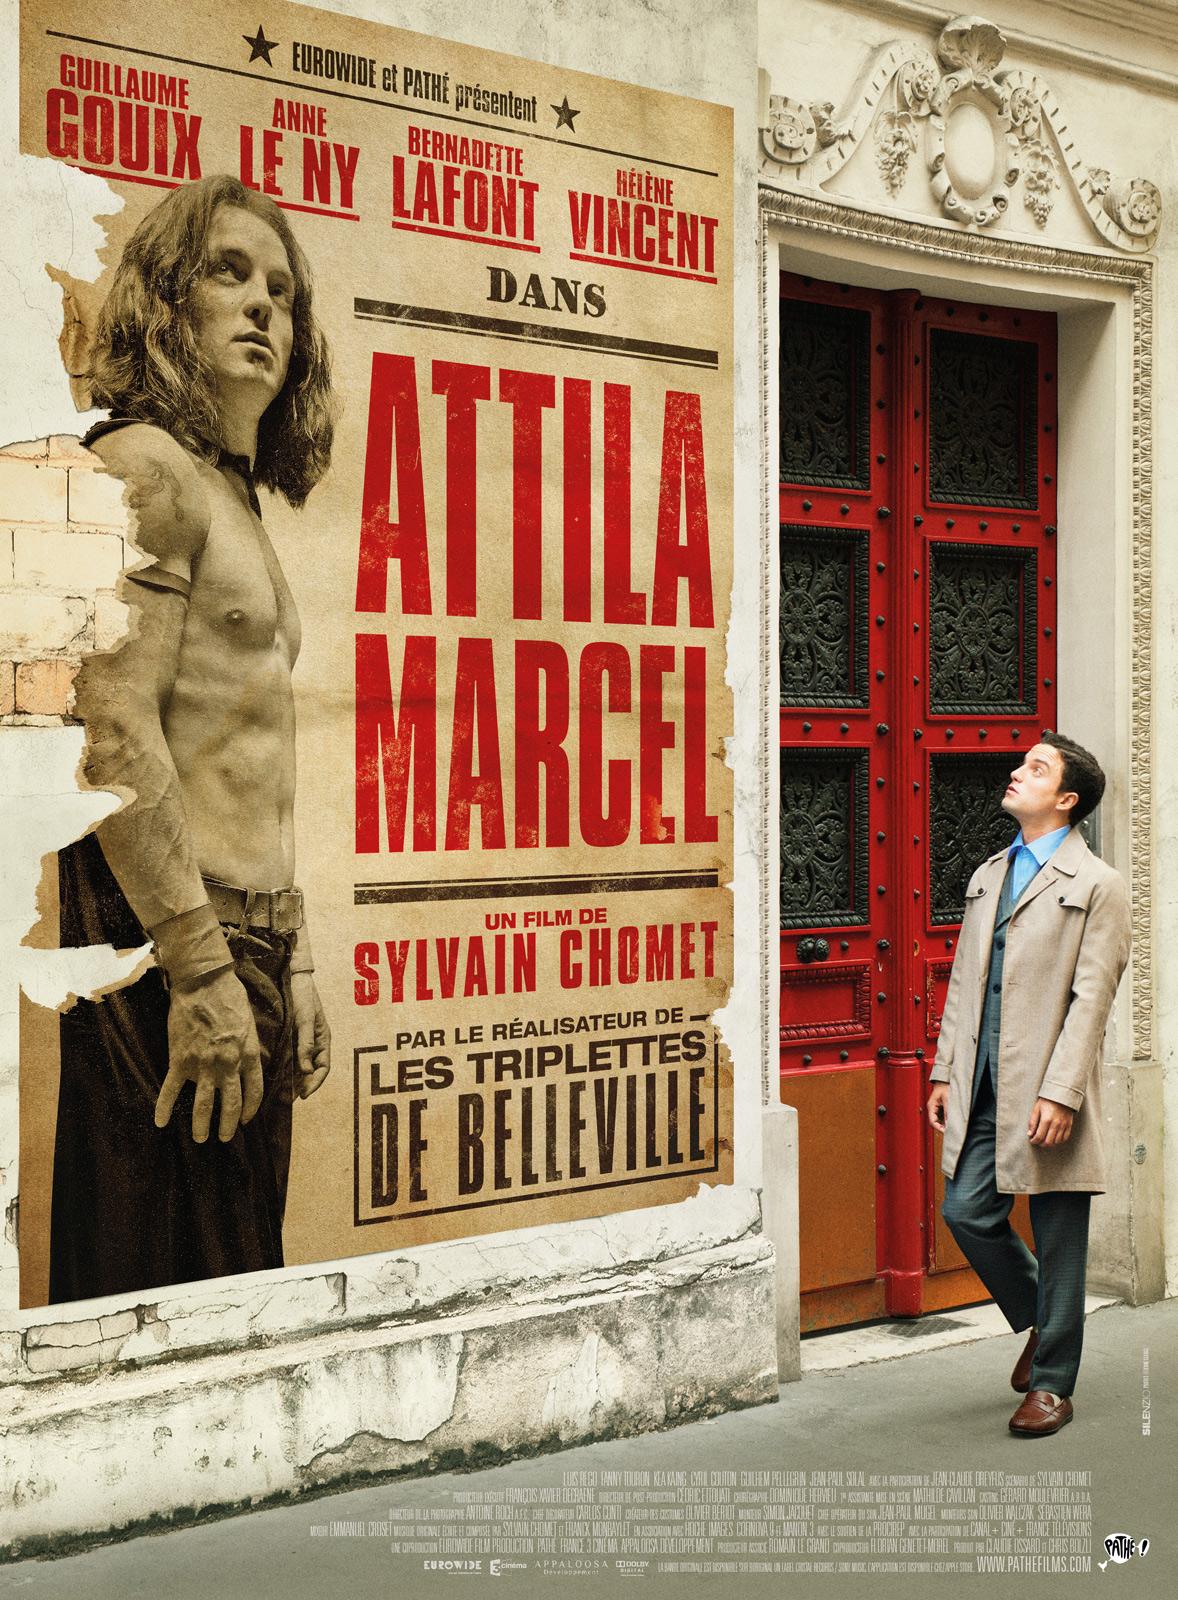 Attila Marcel - 06/11/2013